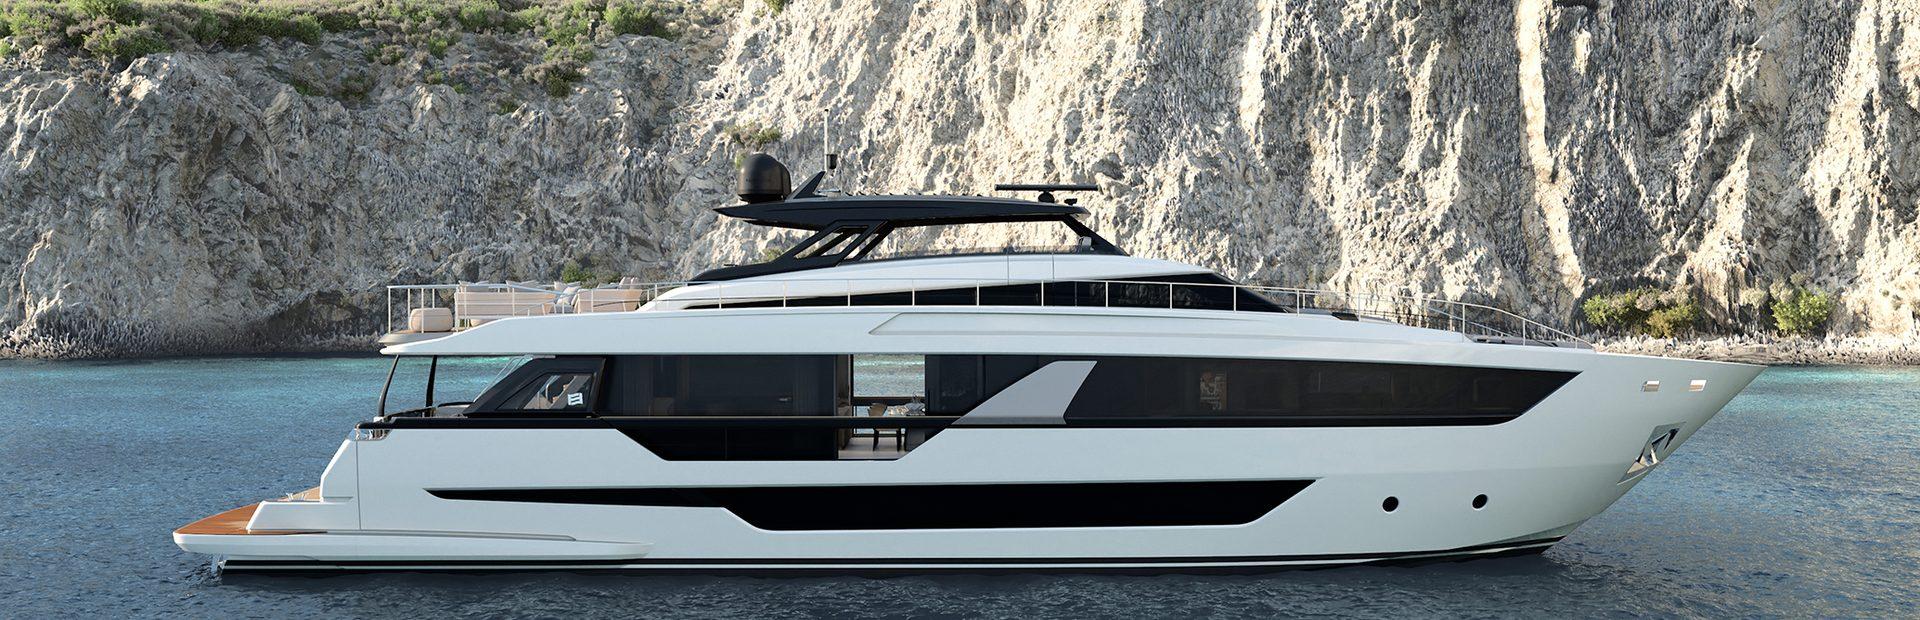 Ferretti Yachts 1000 Yacht Charter